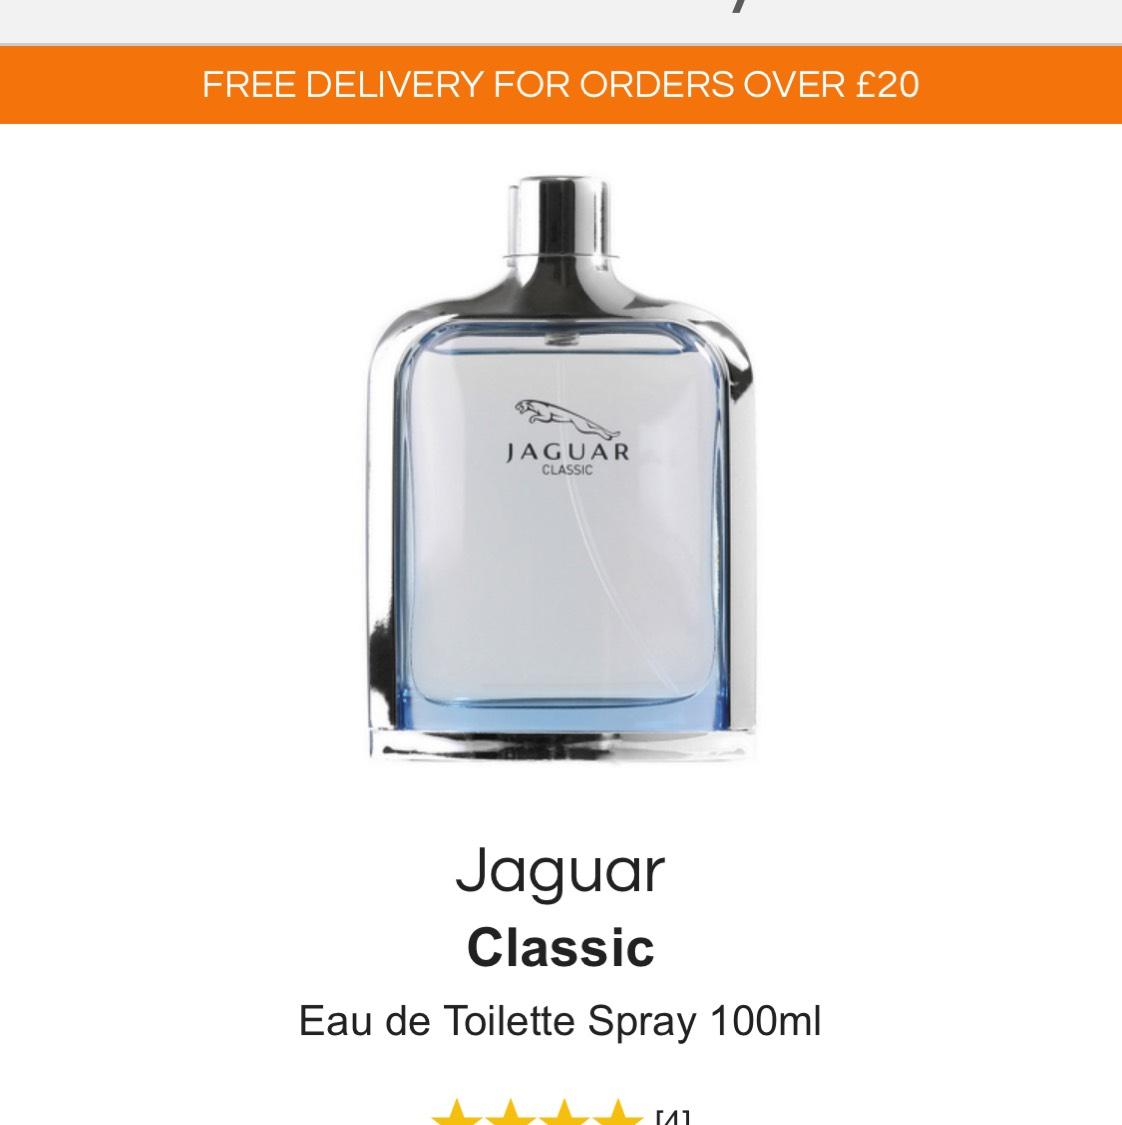 Jaguar Classic Eau de Toilette Spray 100ml @ allbeauty now £12.90